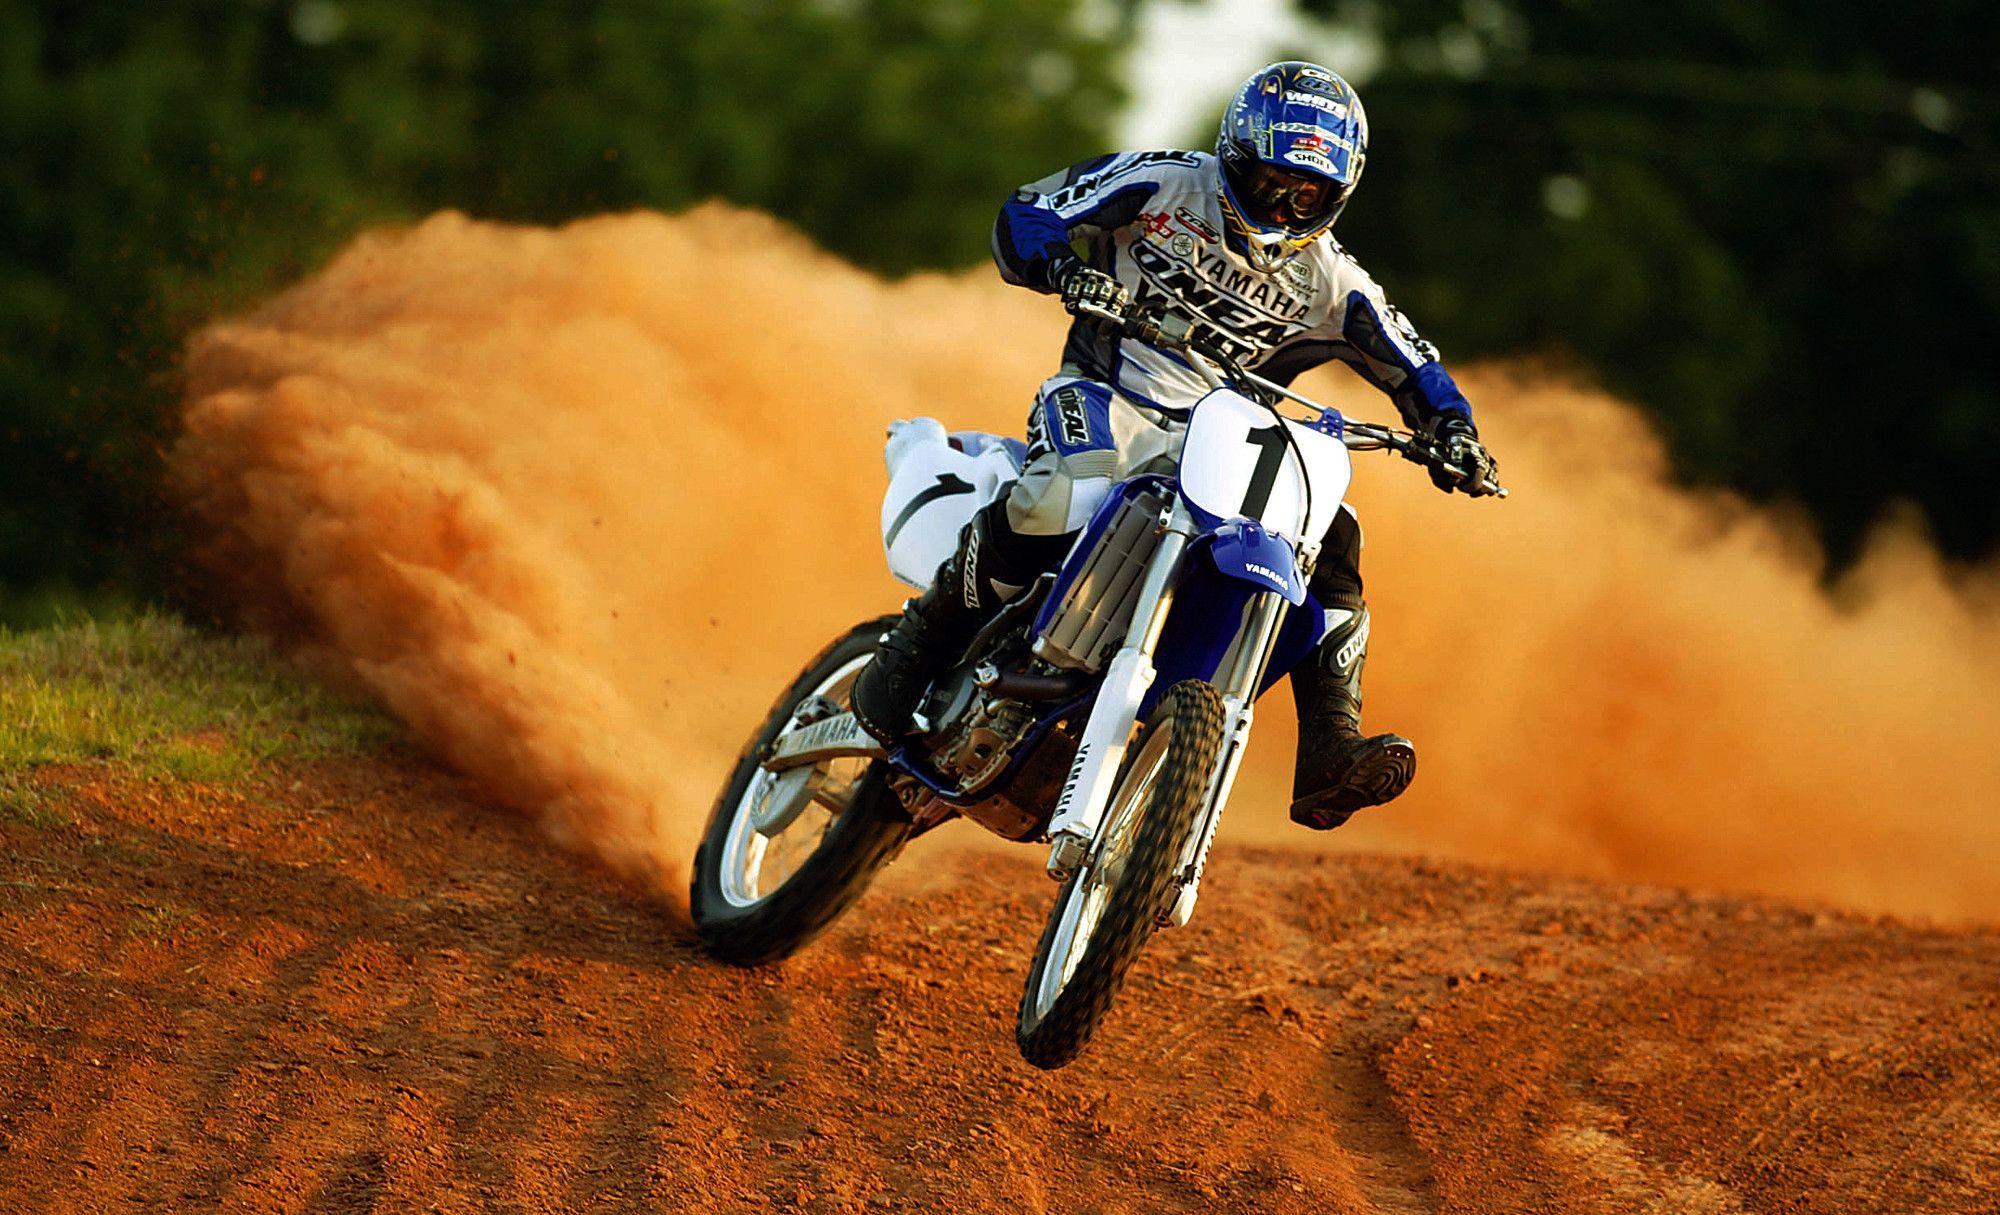 Motocross Wallpapers Yamaha Wallpaper Cave